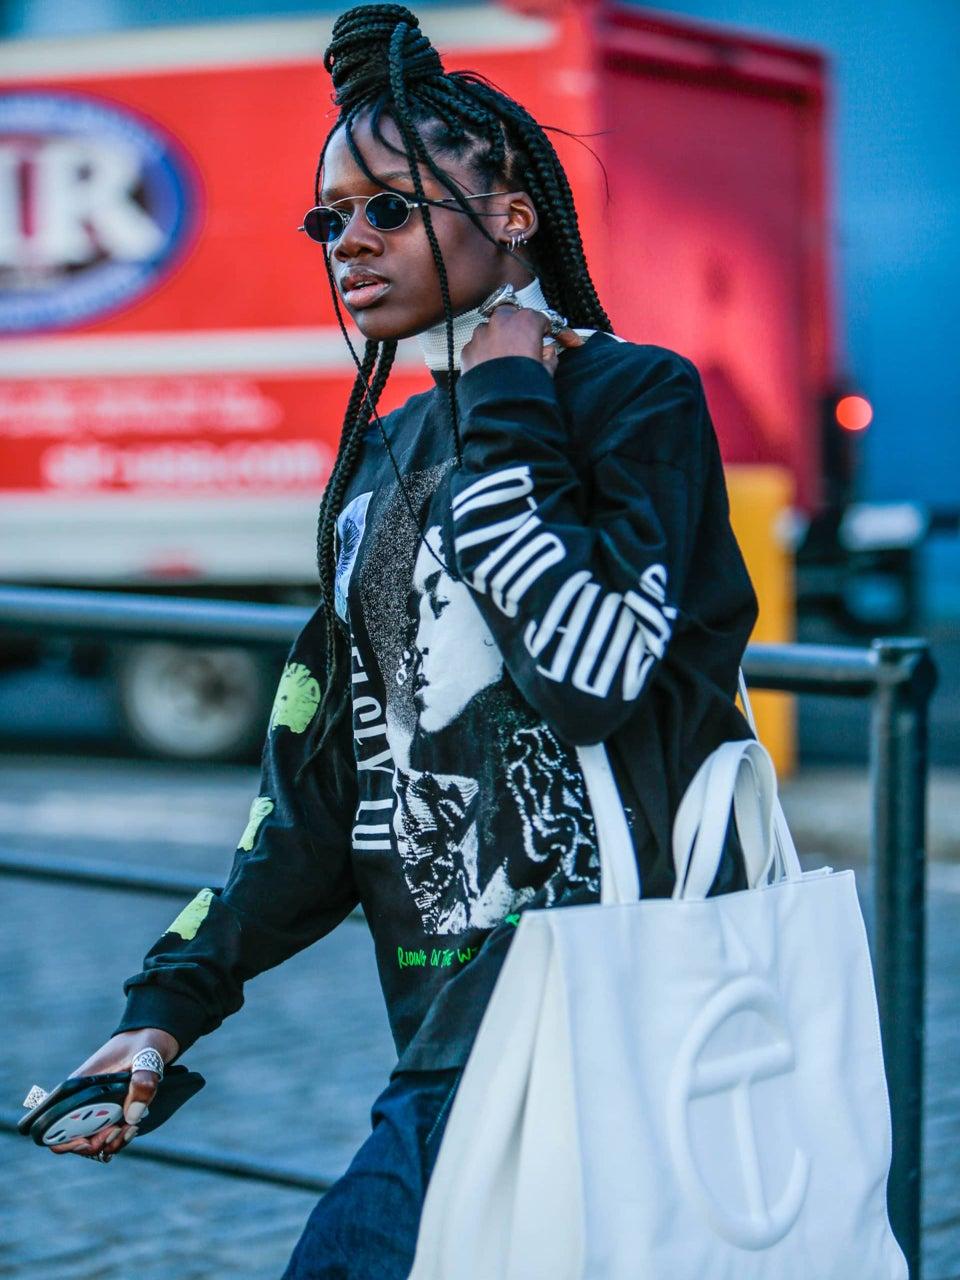 Is The Telfar Shopping Bag The Millenials' Birkin?